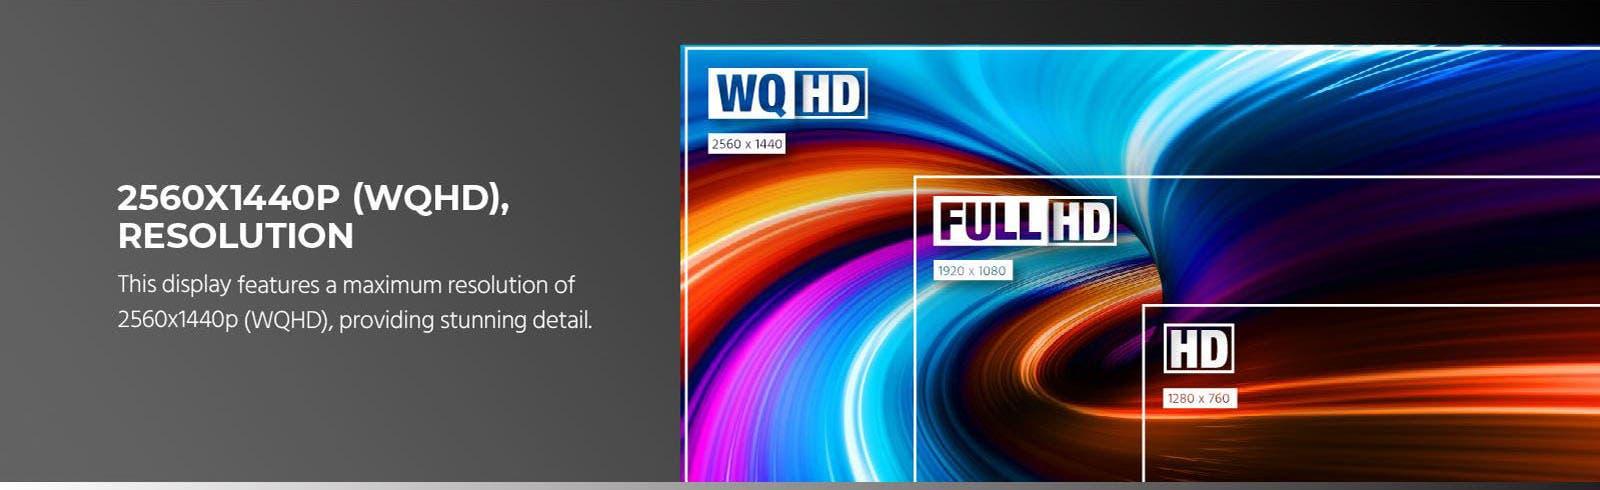 WQHD Monitor